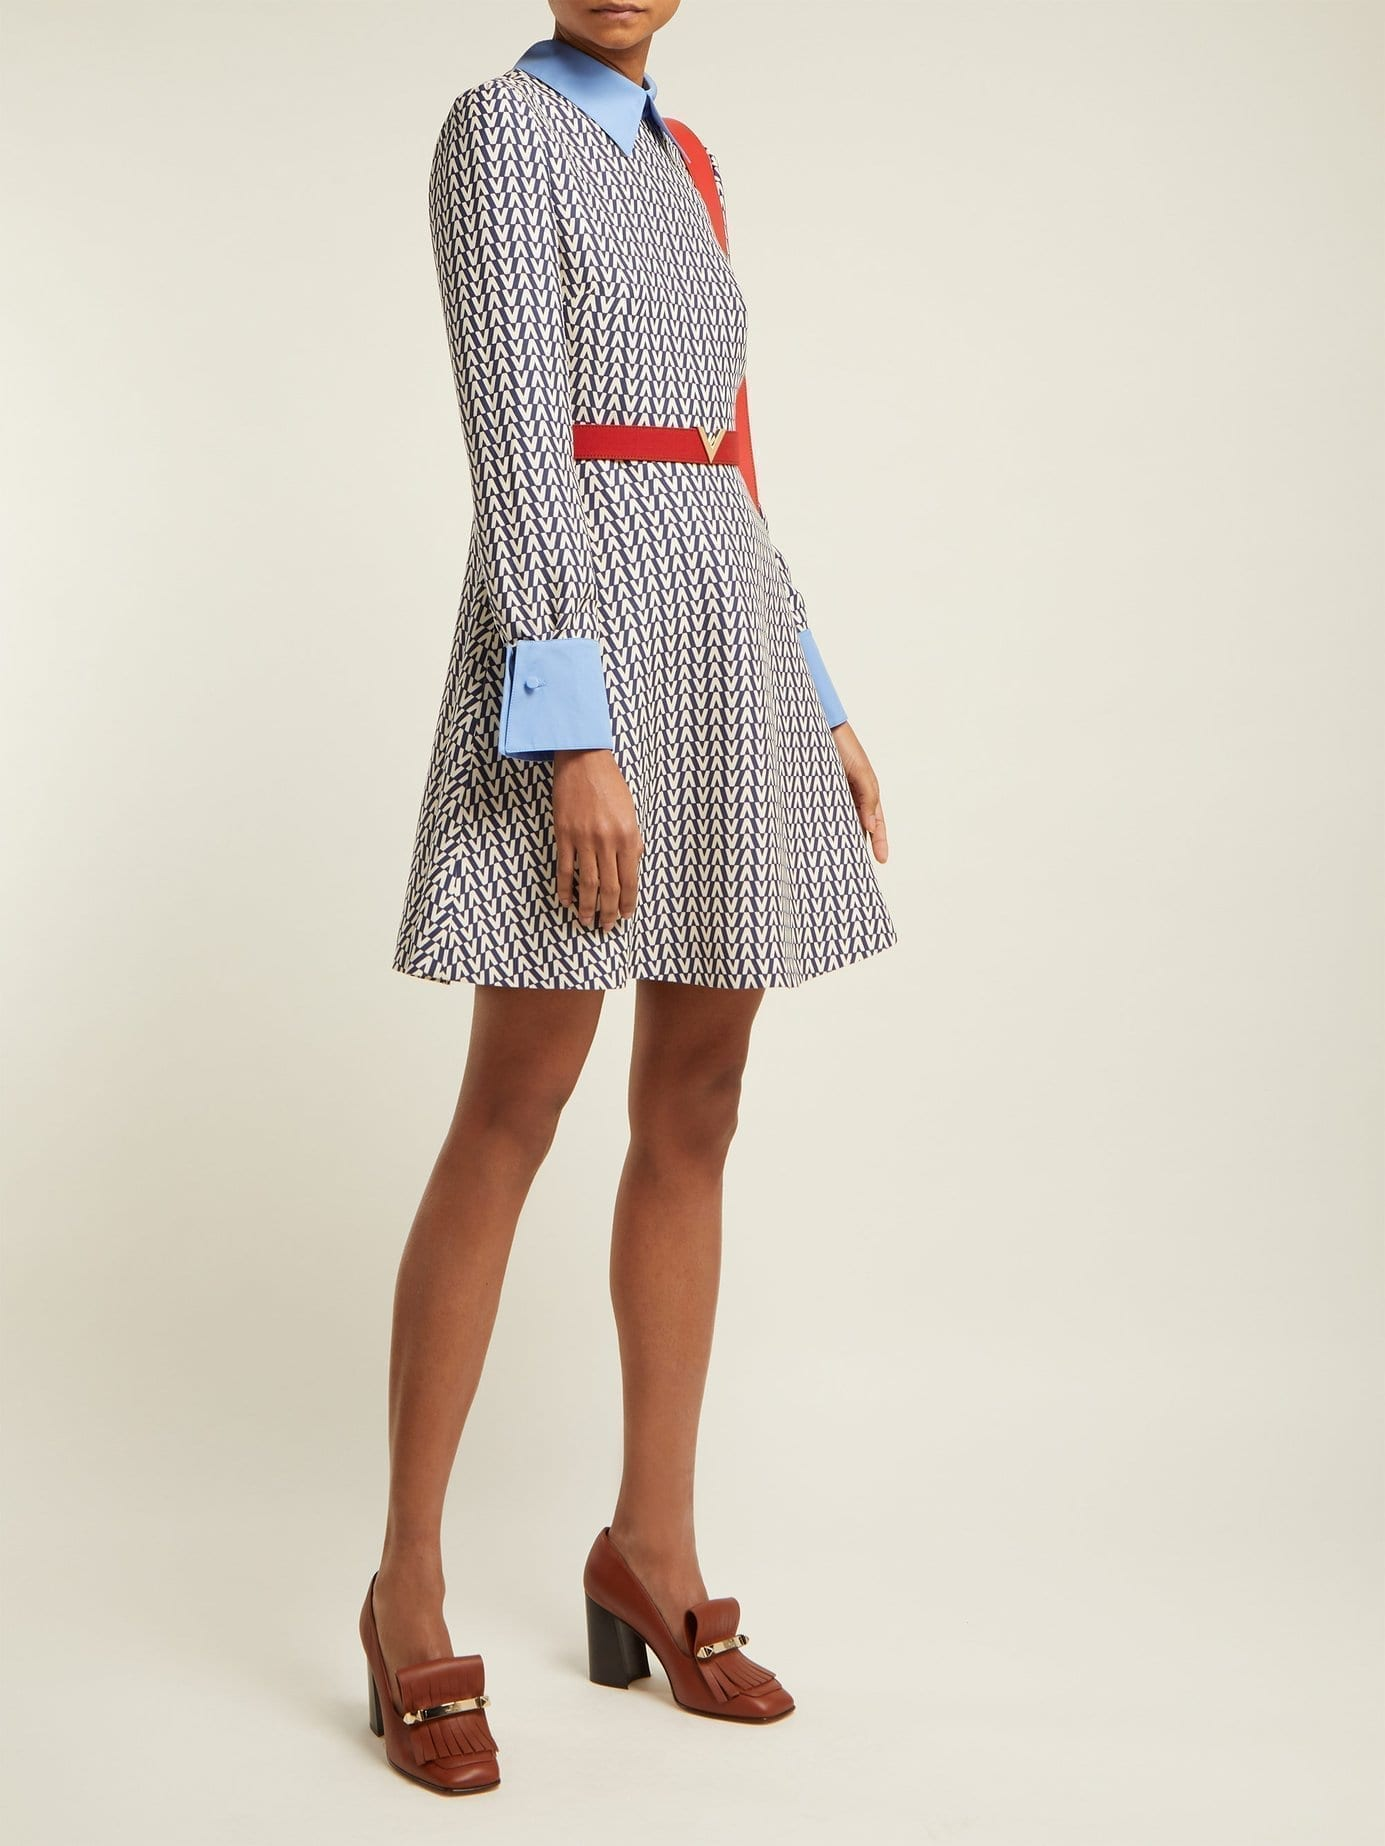 Valentino Optical Print Wool And Silk Blend Mini Blue Dress